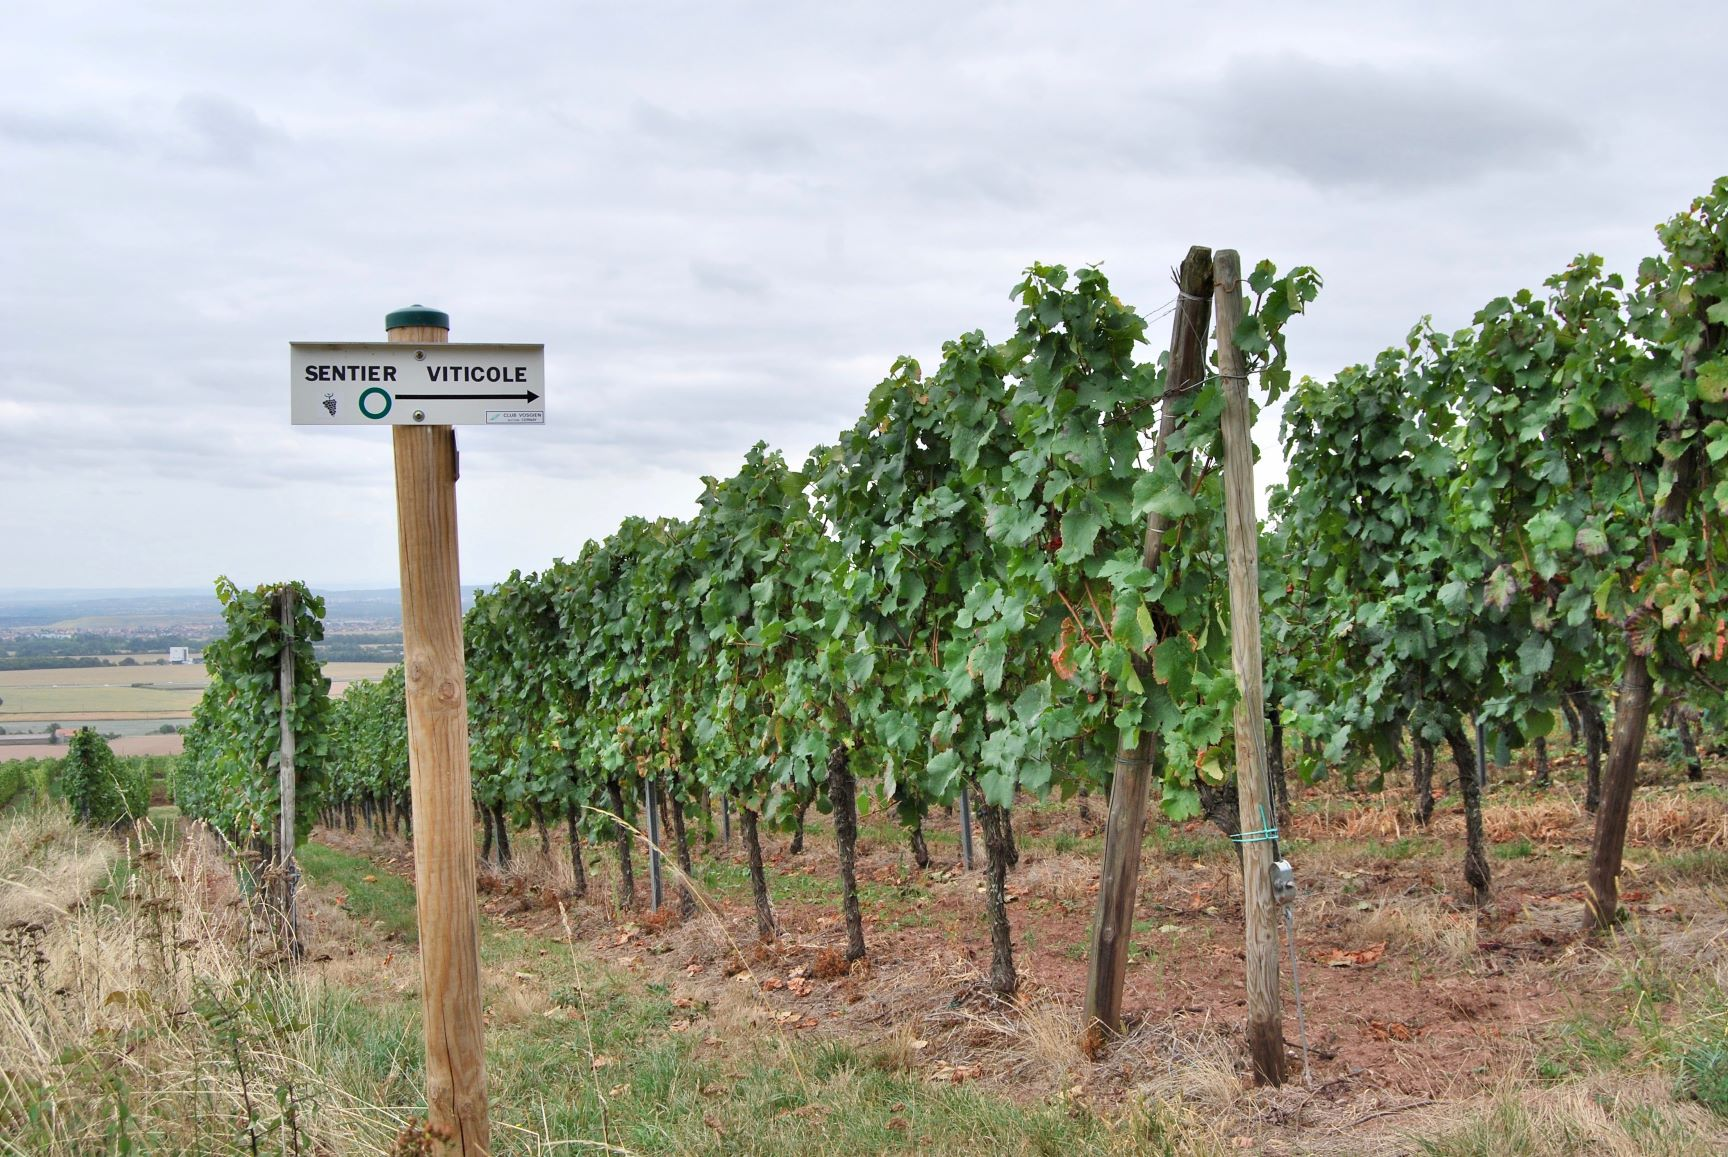 Sentier viticole.1.jpg